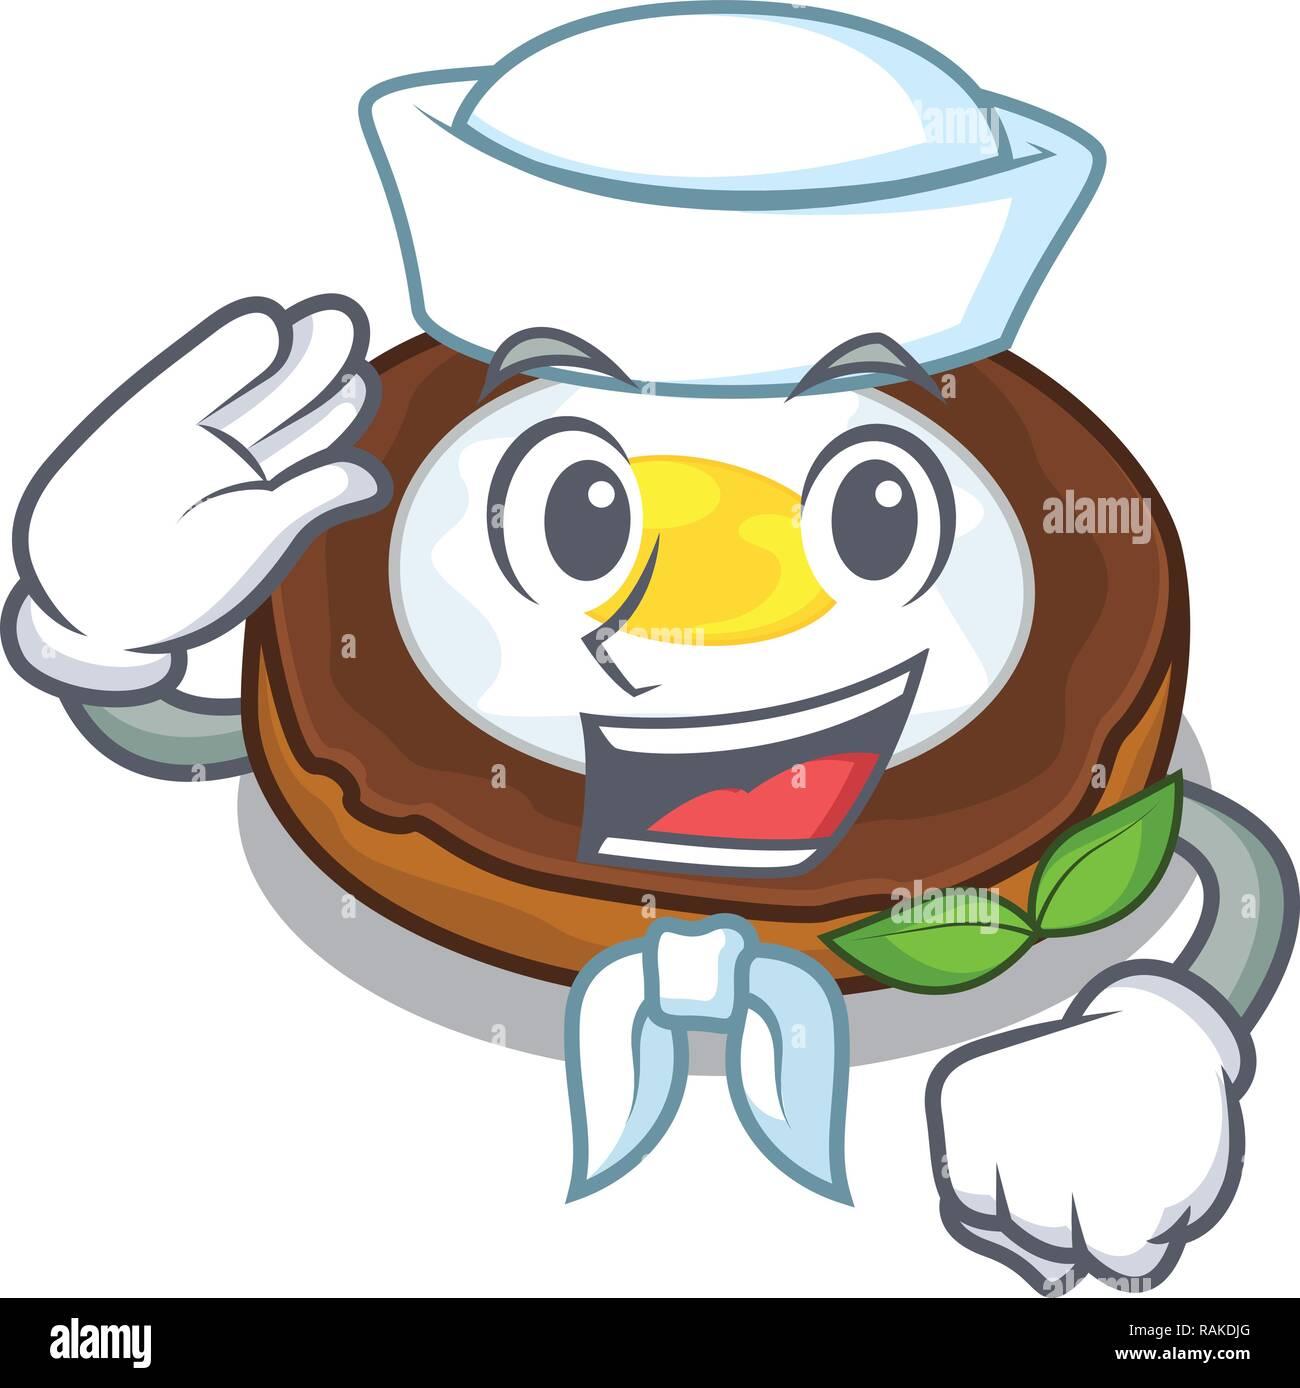 Sailor egg scotch cartoons are ready served - Stock Vector